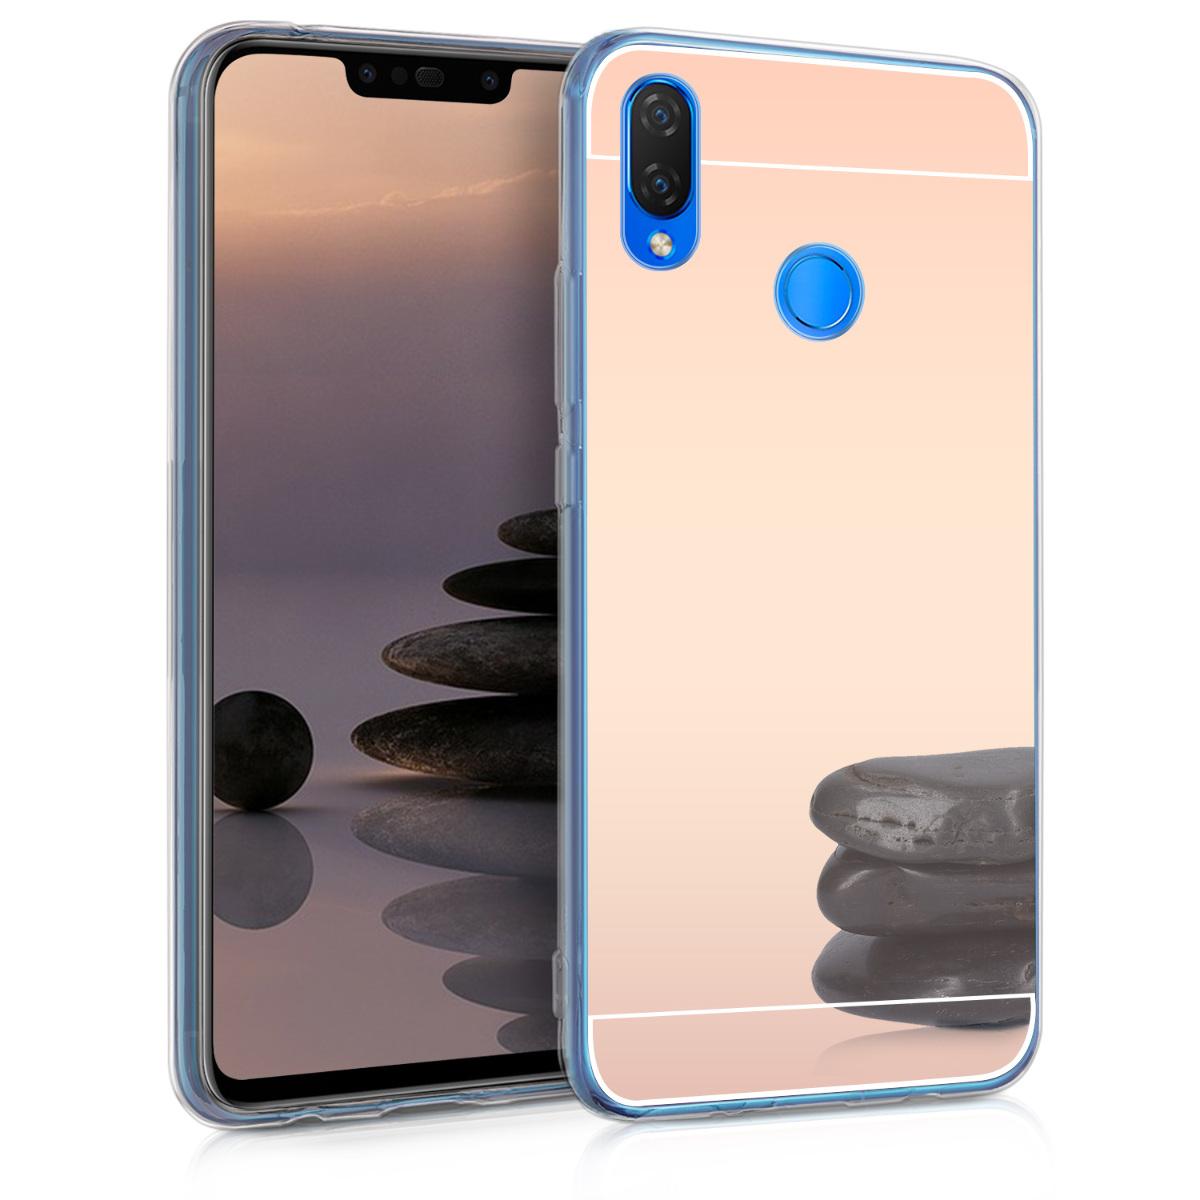 KW Θήκη Σιλικόνης με Καθρέφτη Huawei P Smart Plus - Rose Gold (46096.81)